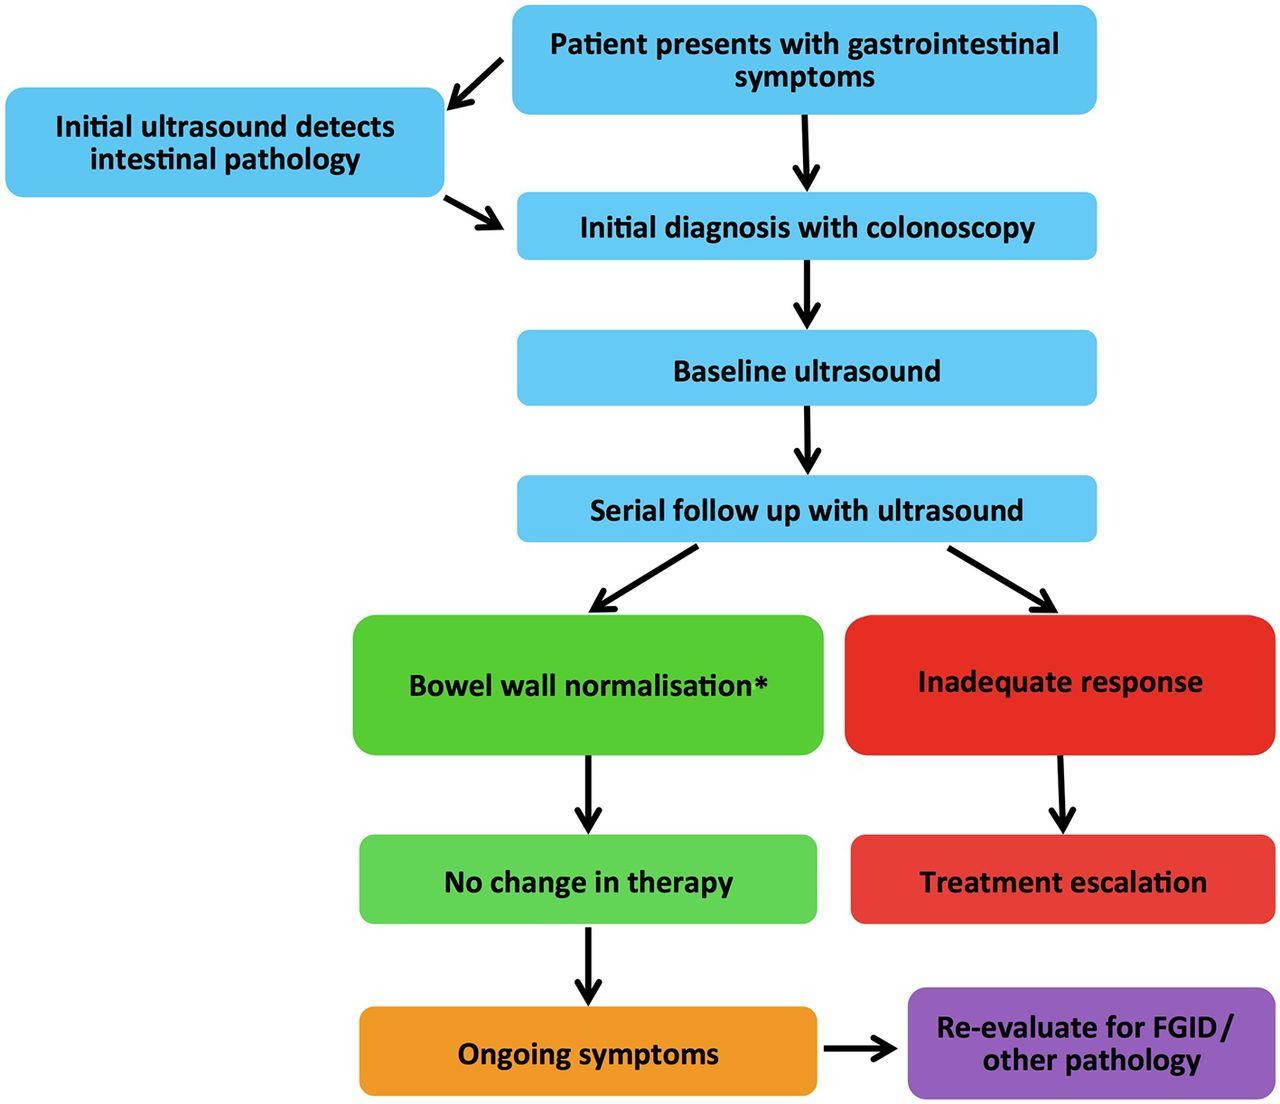 Gastrointestinal ultrasound in inflammatory bowel disease: an